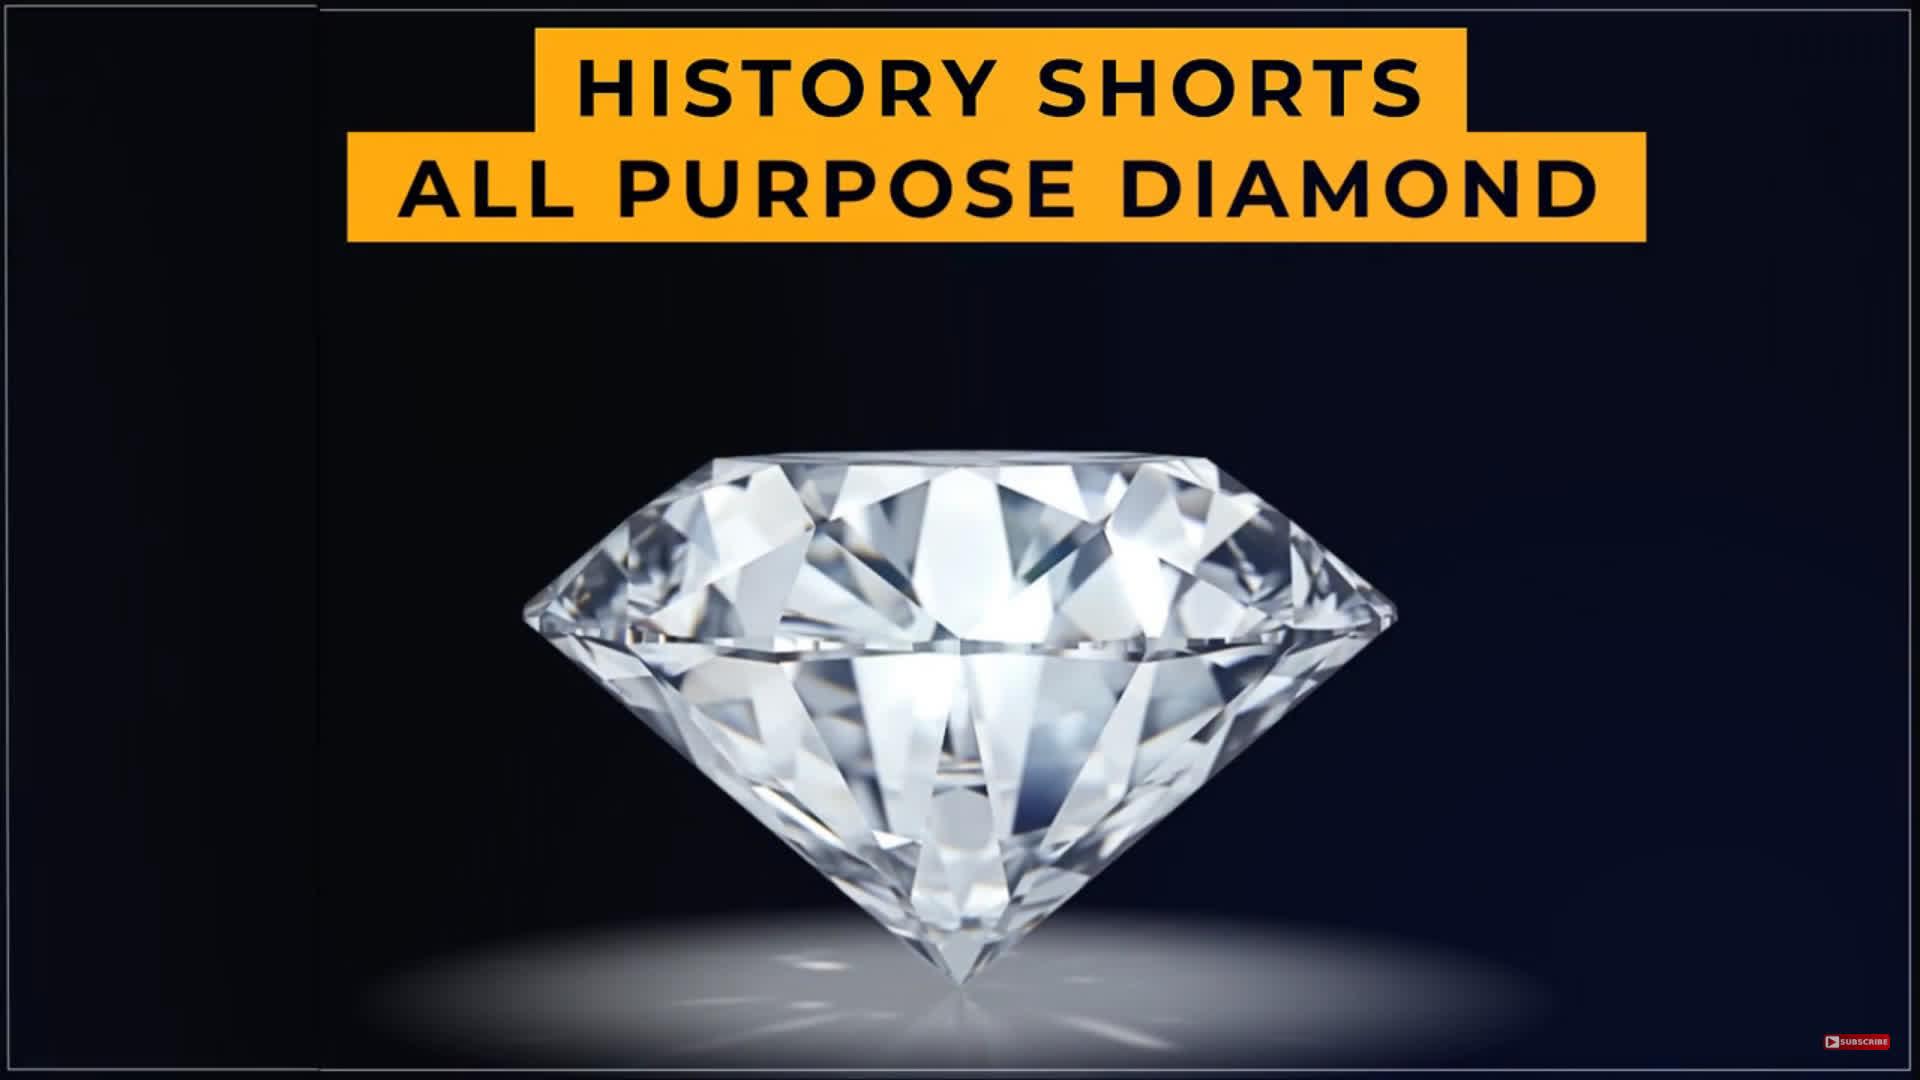 All Purpose Diamond | History Shorts